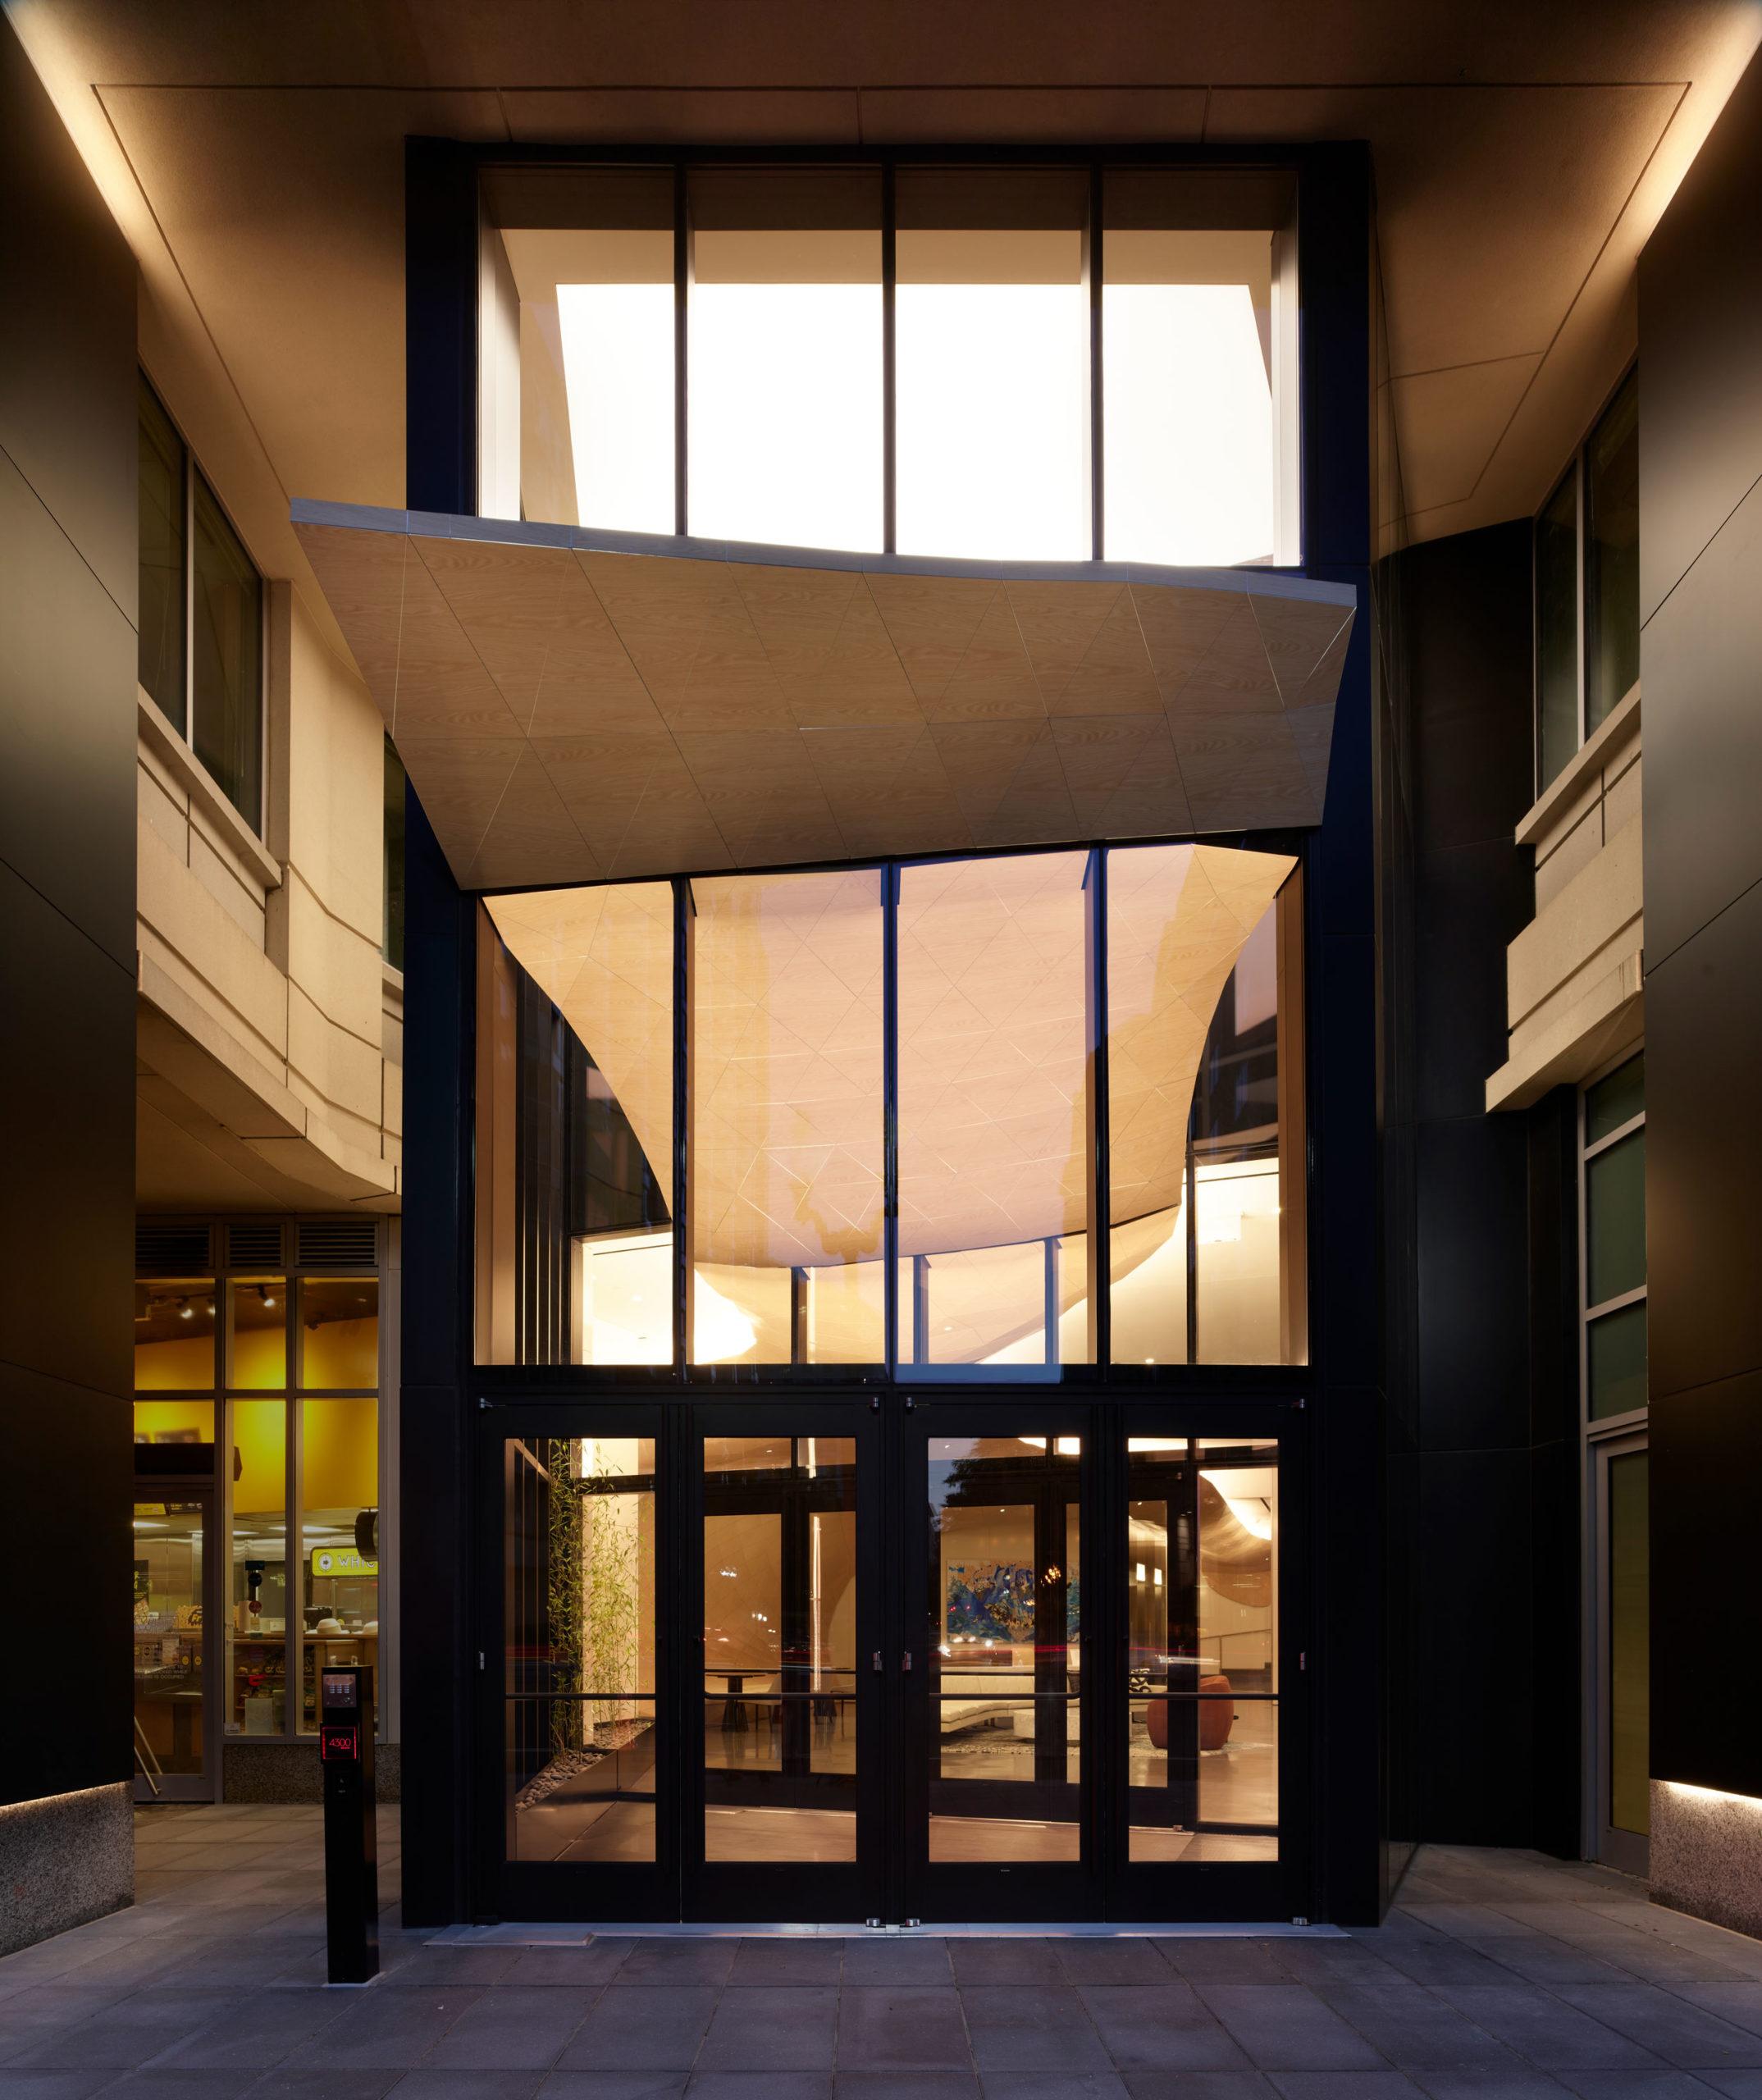 Ballston Point, Arlington, Virginia, Gensler, Interior Design, Photography James John Jetel